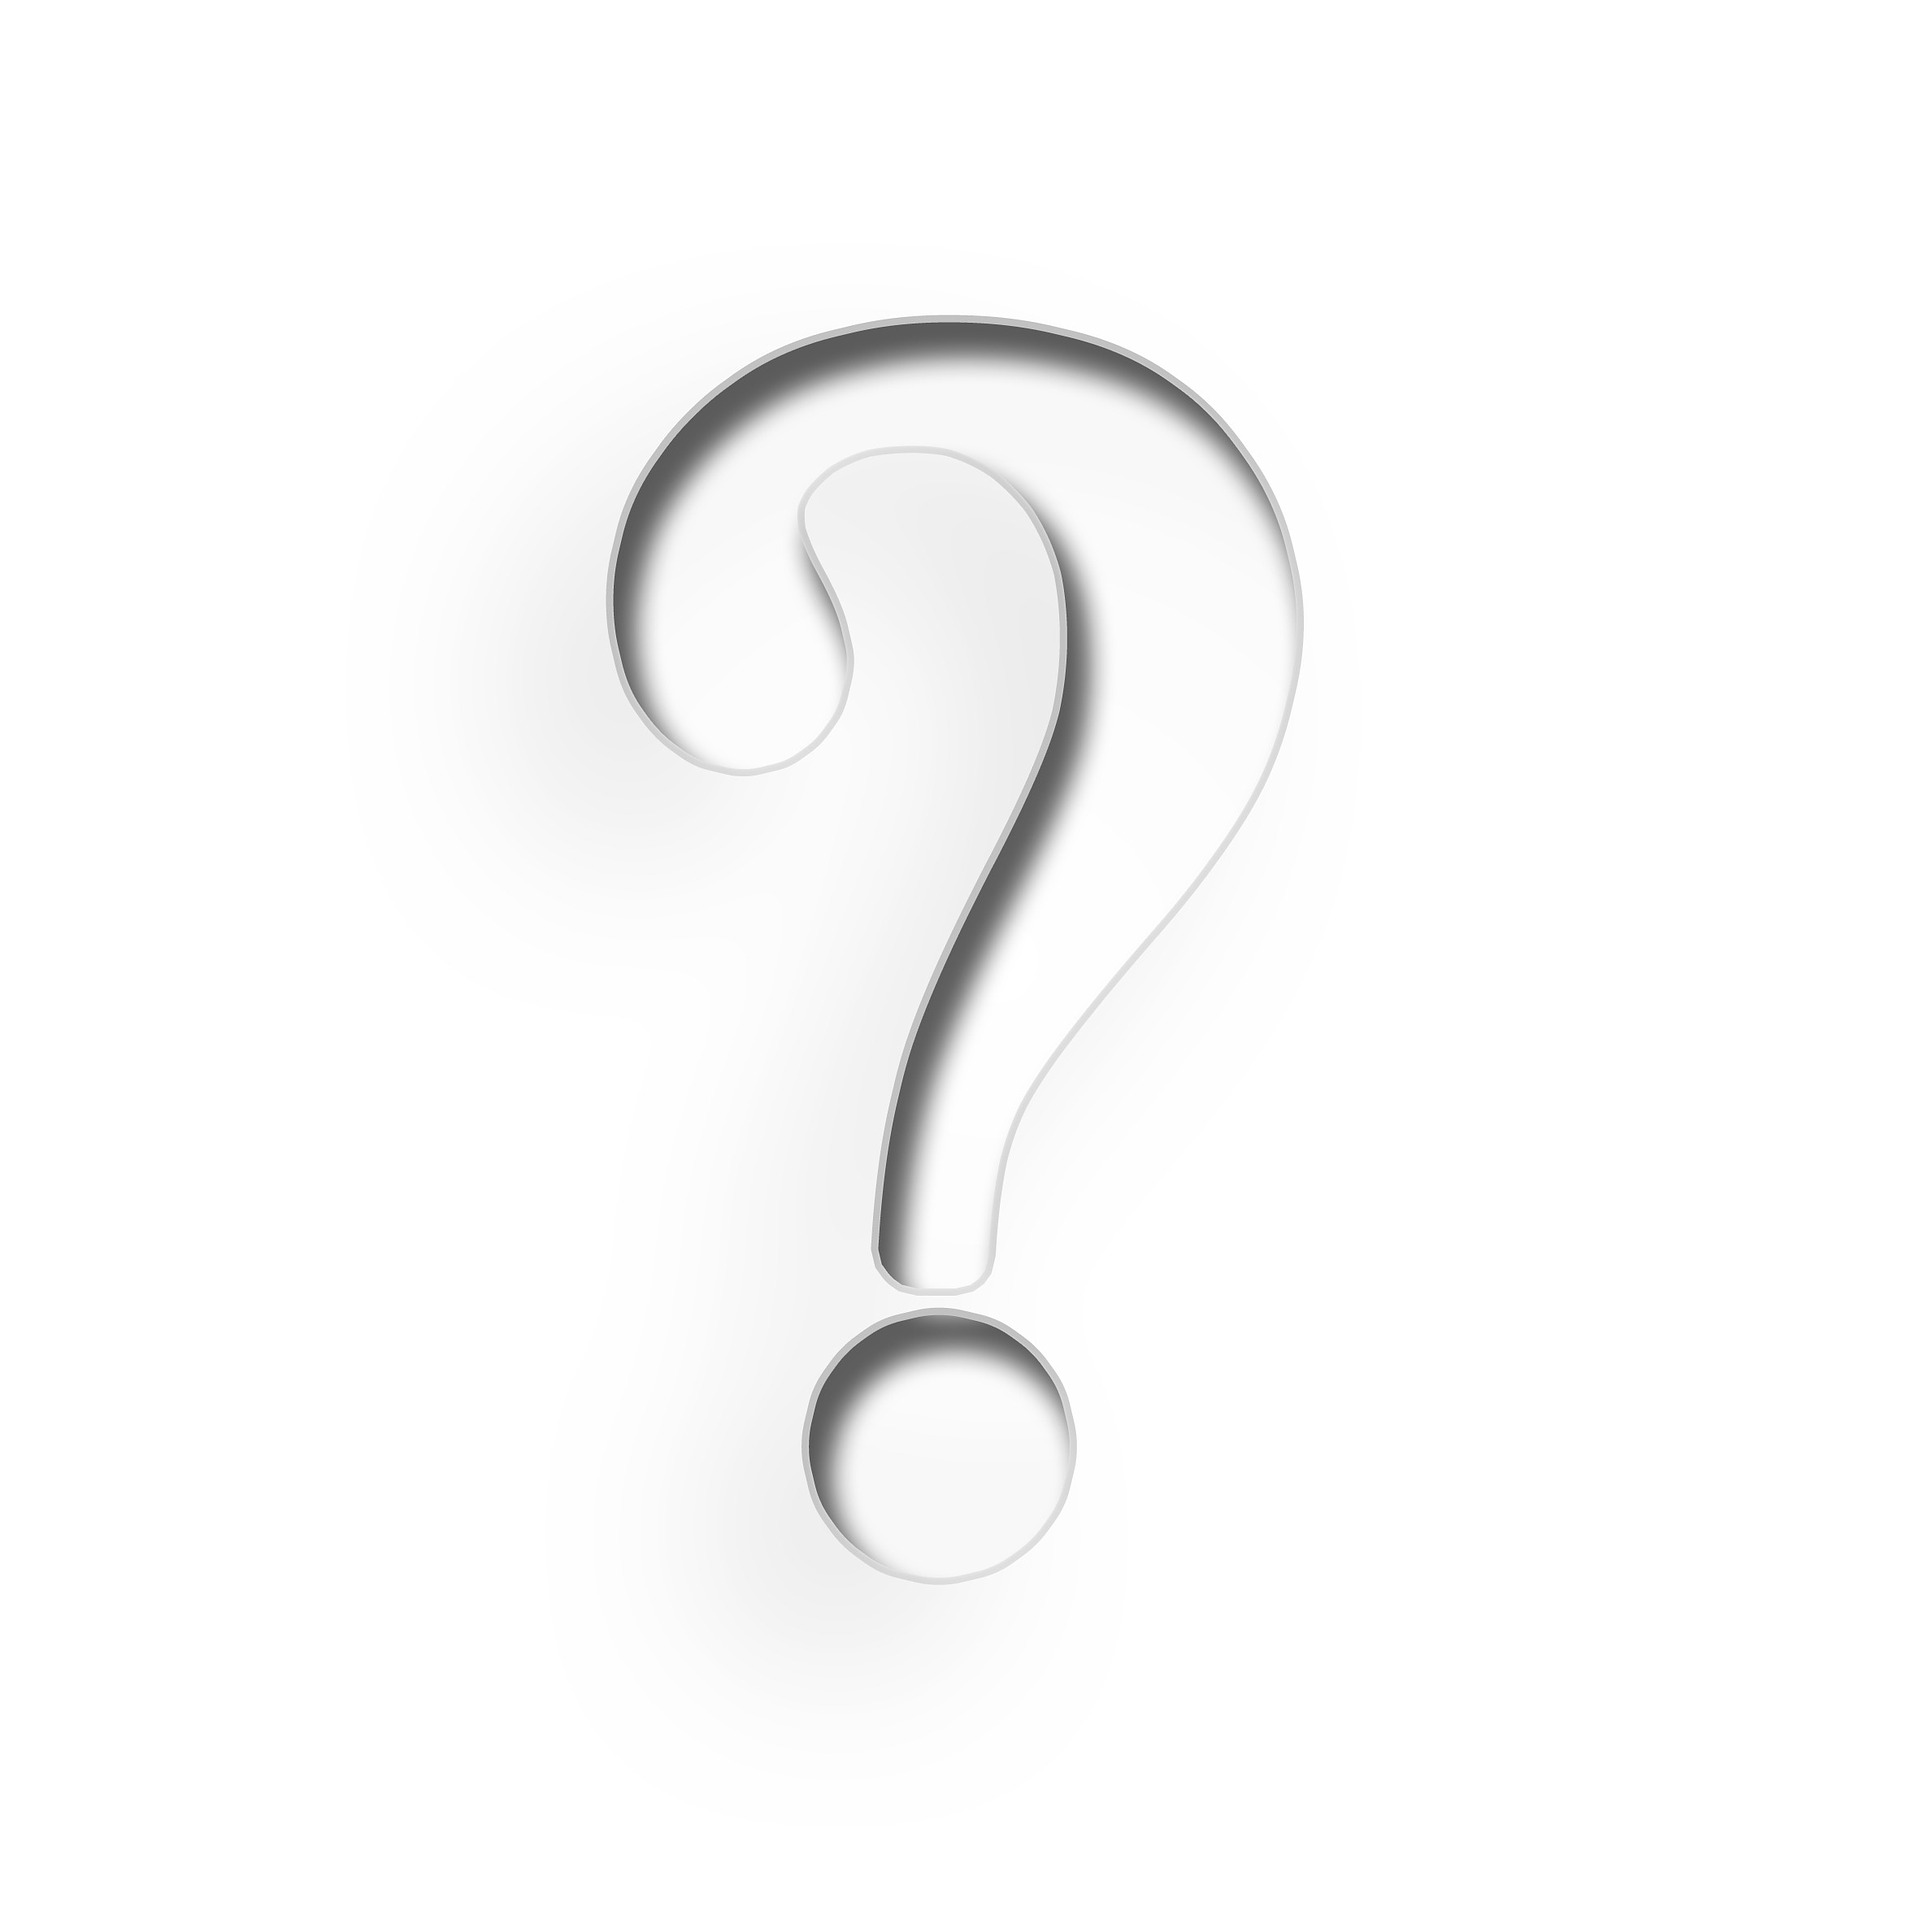 question-mark-271039_1920.jpg